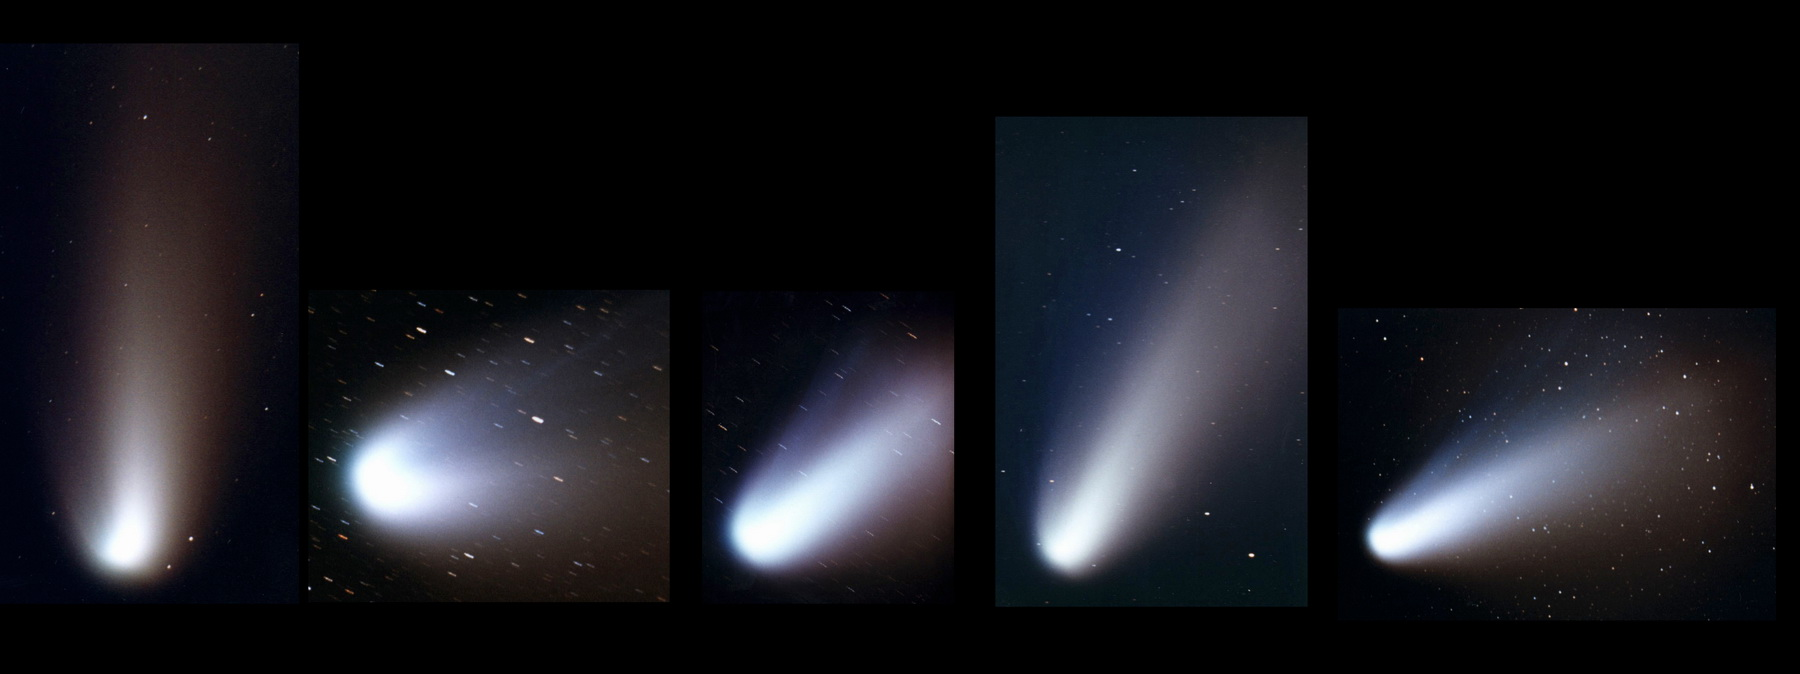 Cometa Hale Bopp en 1995